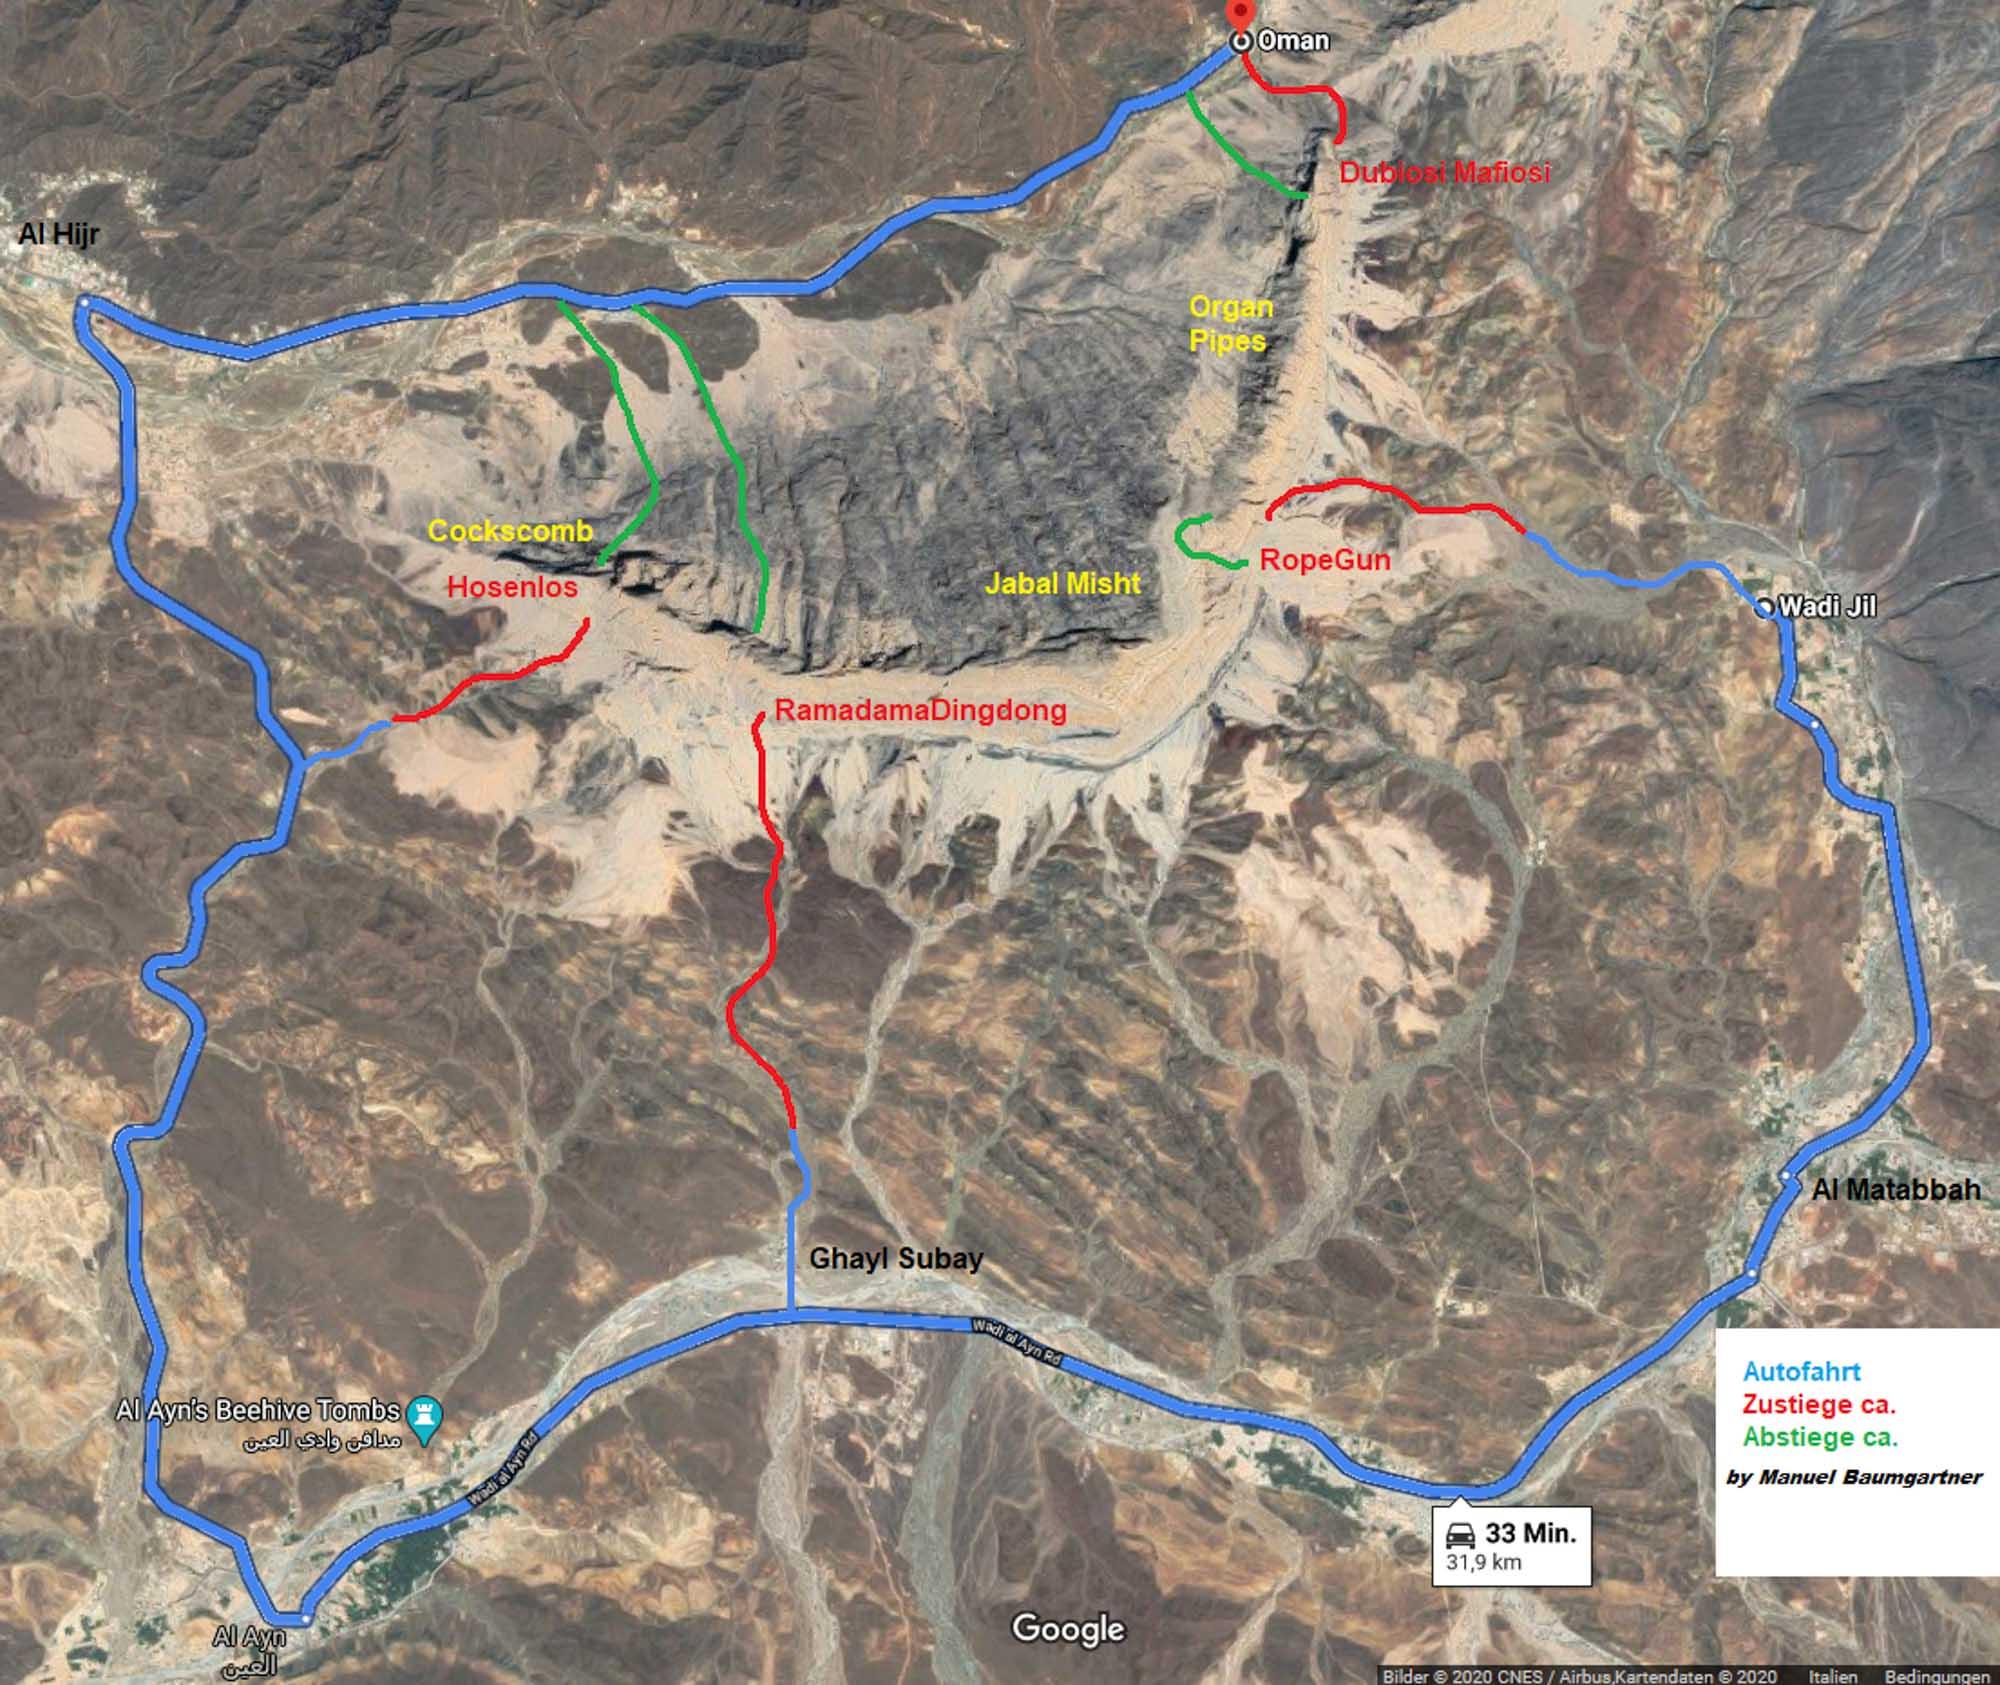 Zustieg Jabal Misht © Manuel Baumgartner und Dietmar Niederbrunner